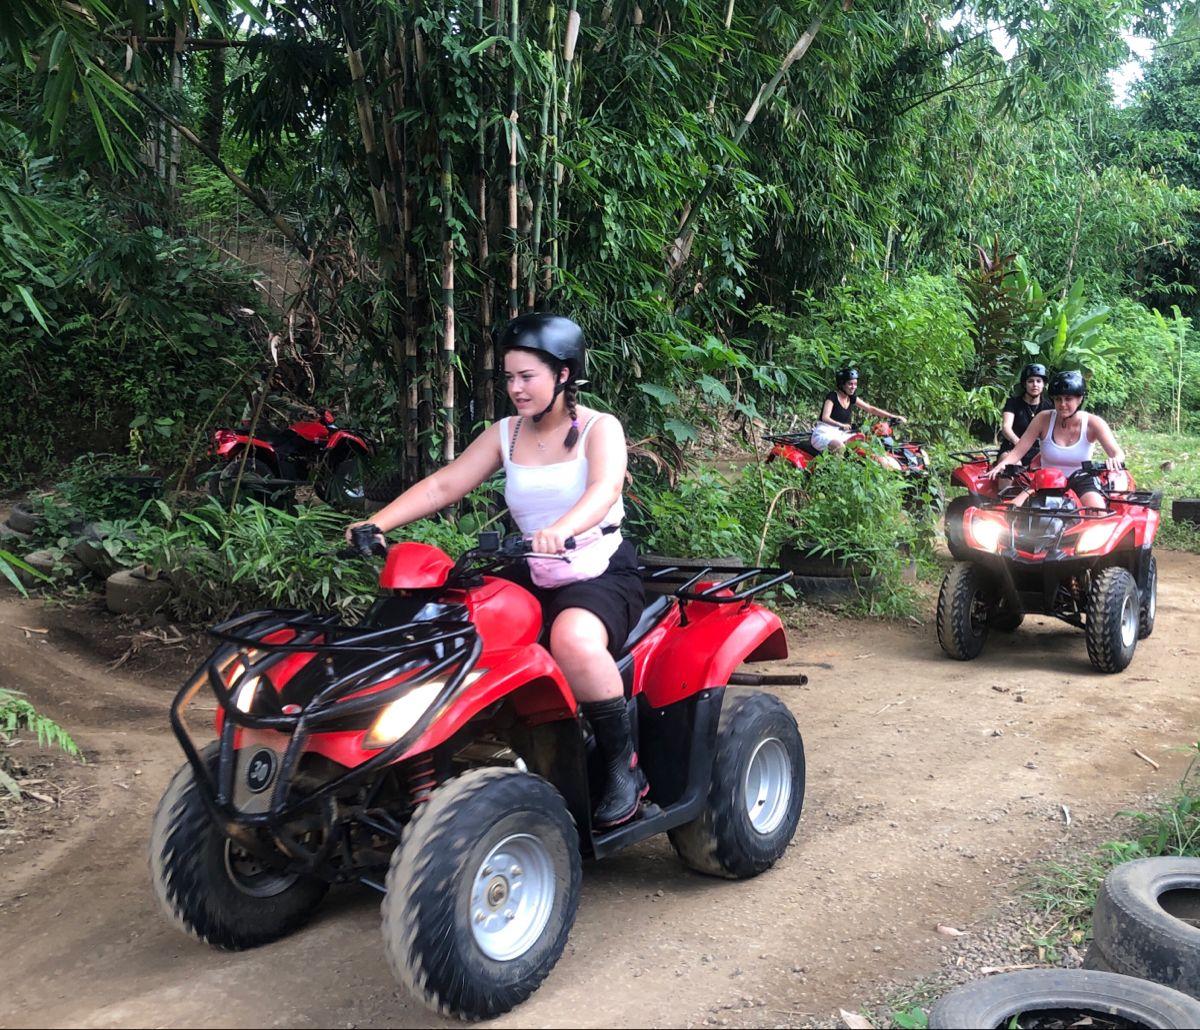 Pin Oleh Gorgeous Bali Tours Di Things To Do In Bali Di 2020